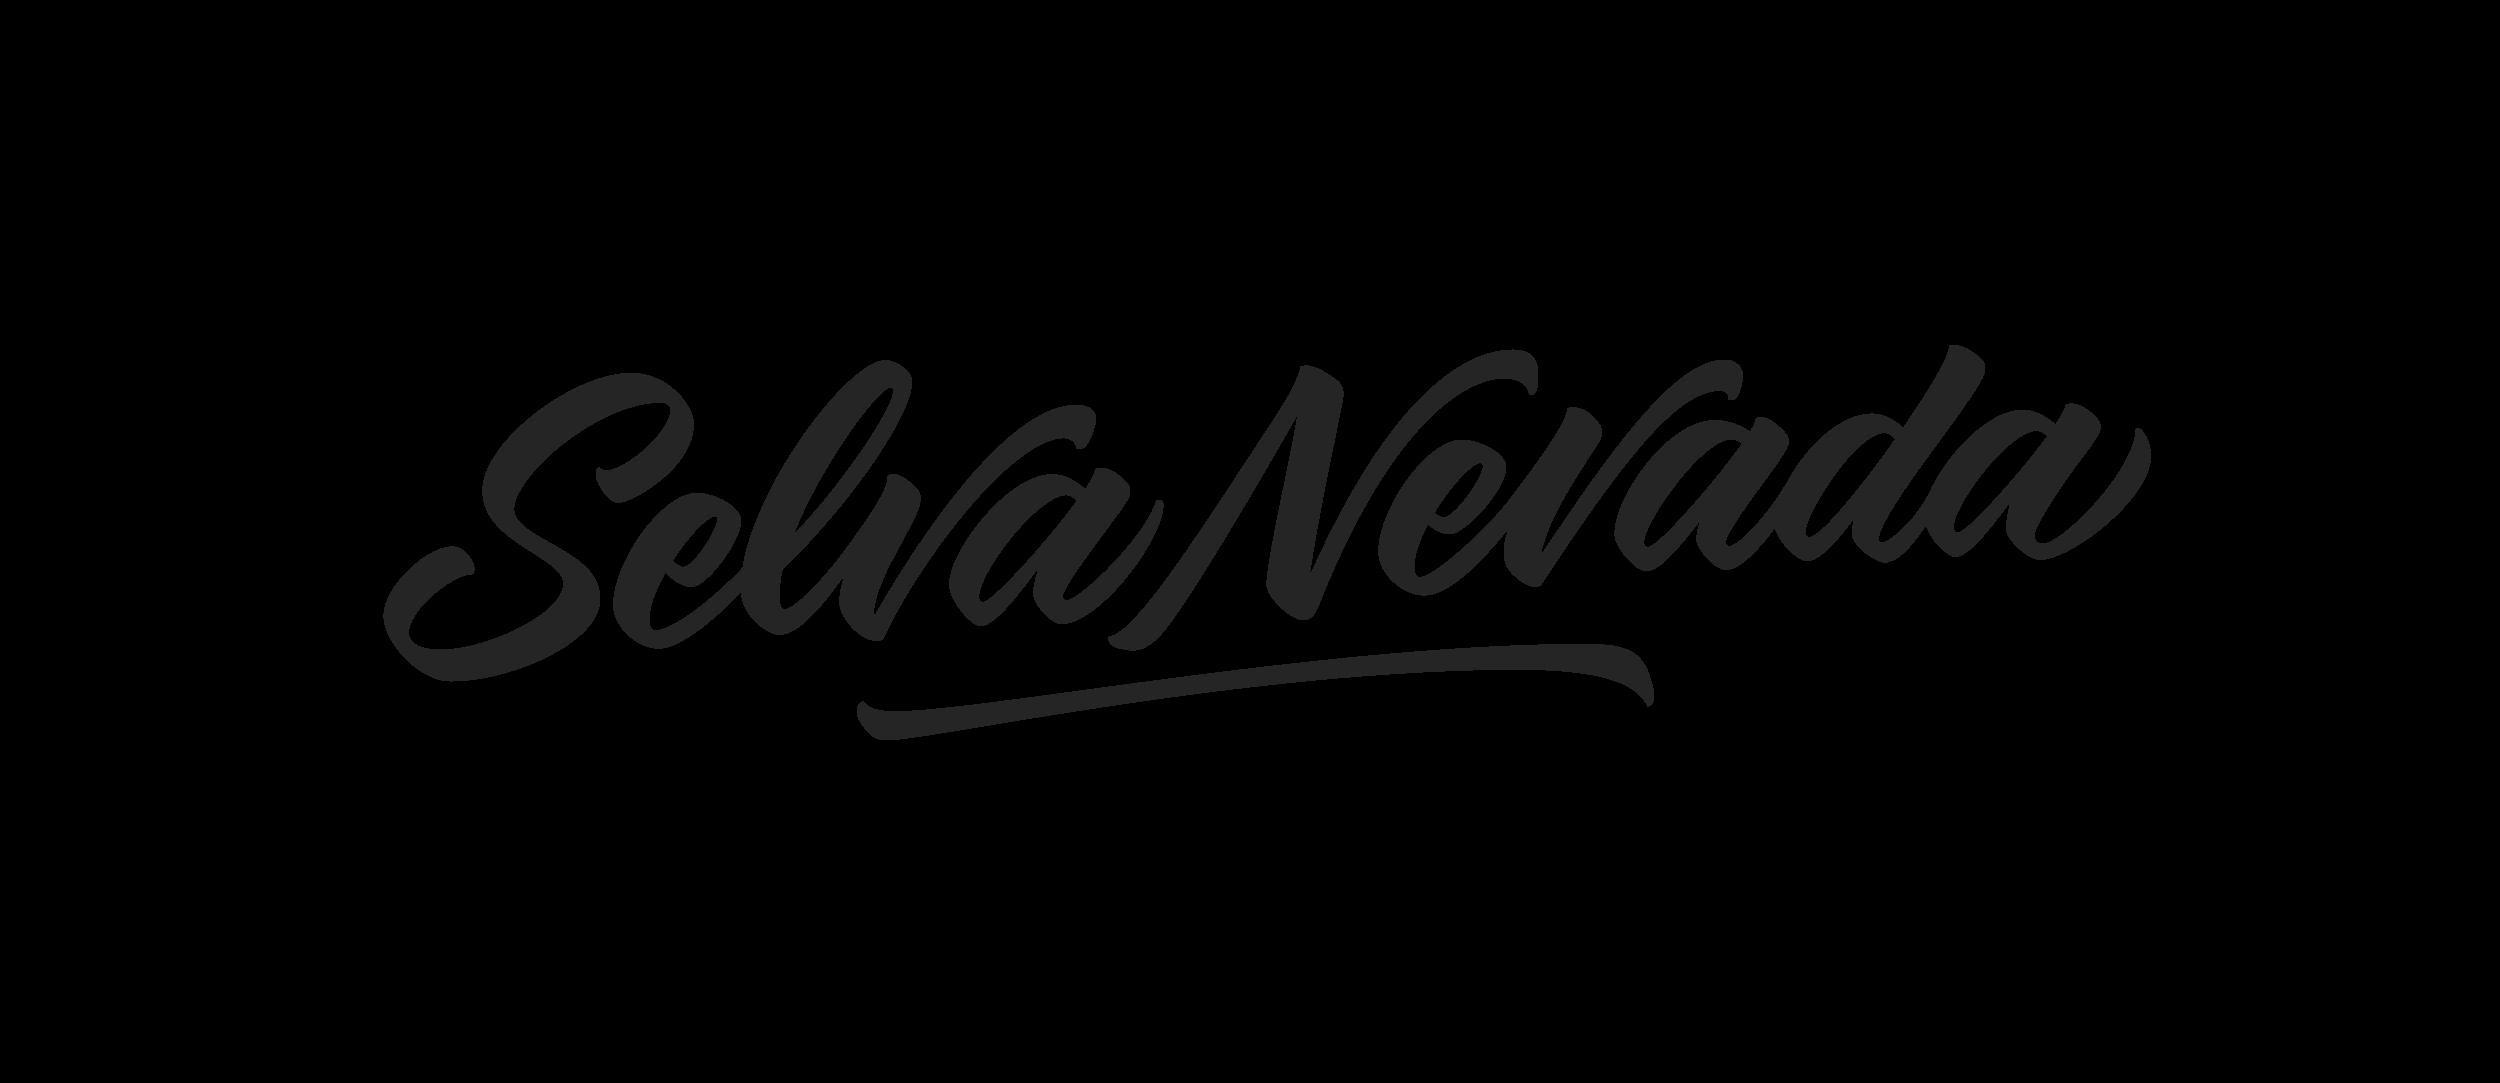 SELVA NEVADA_logo_by_Yanina-Arabena_Guillermo-Vizzari_01.png